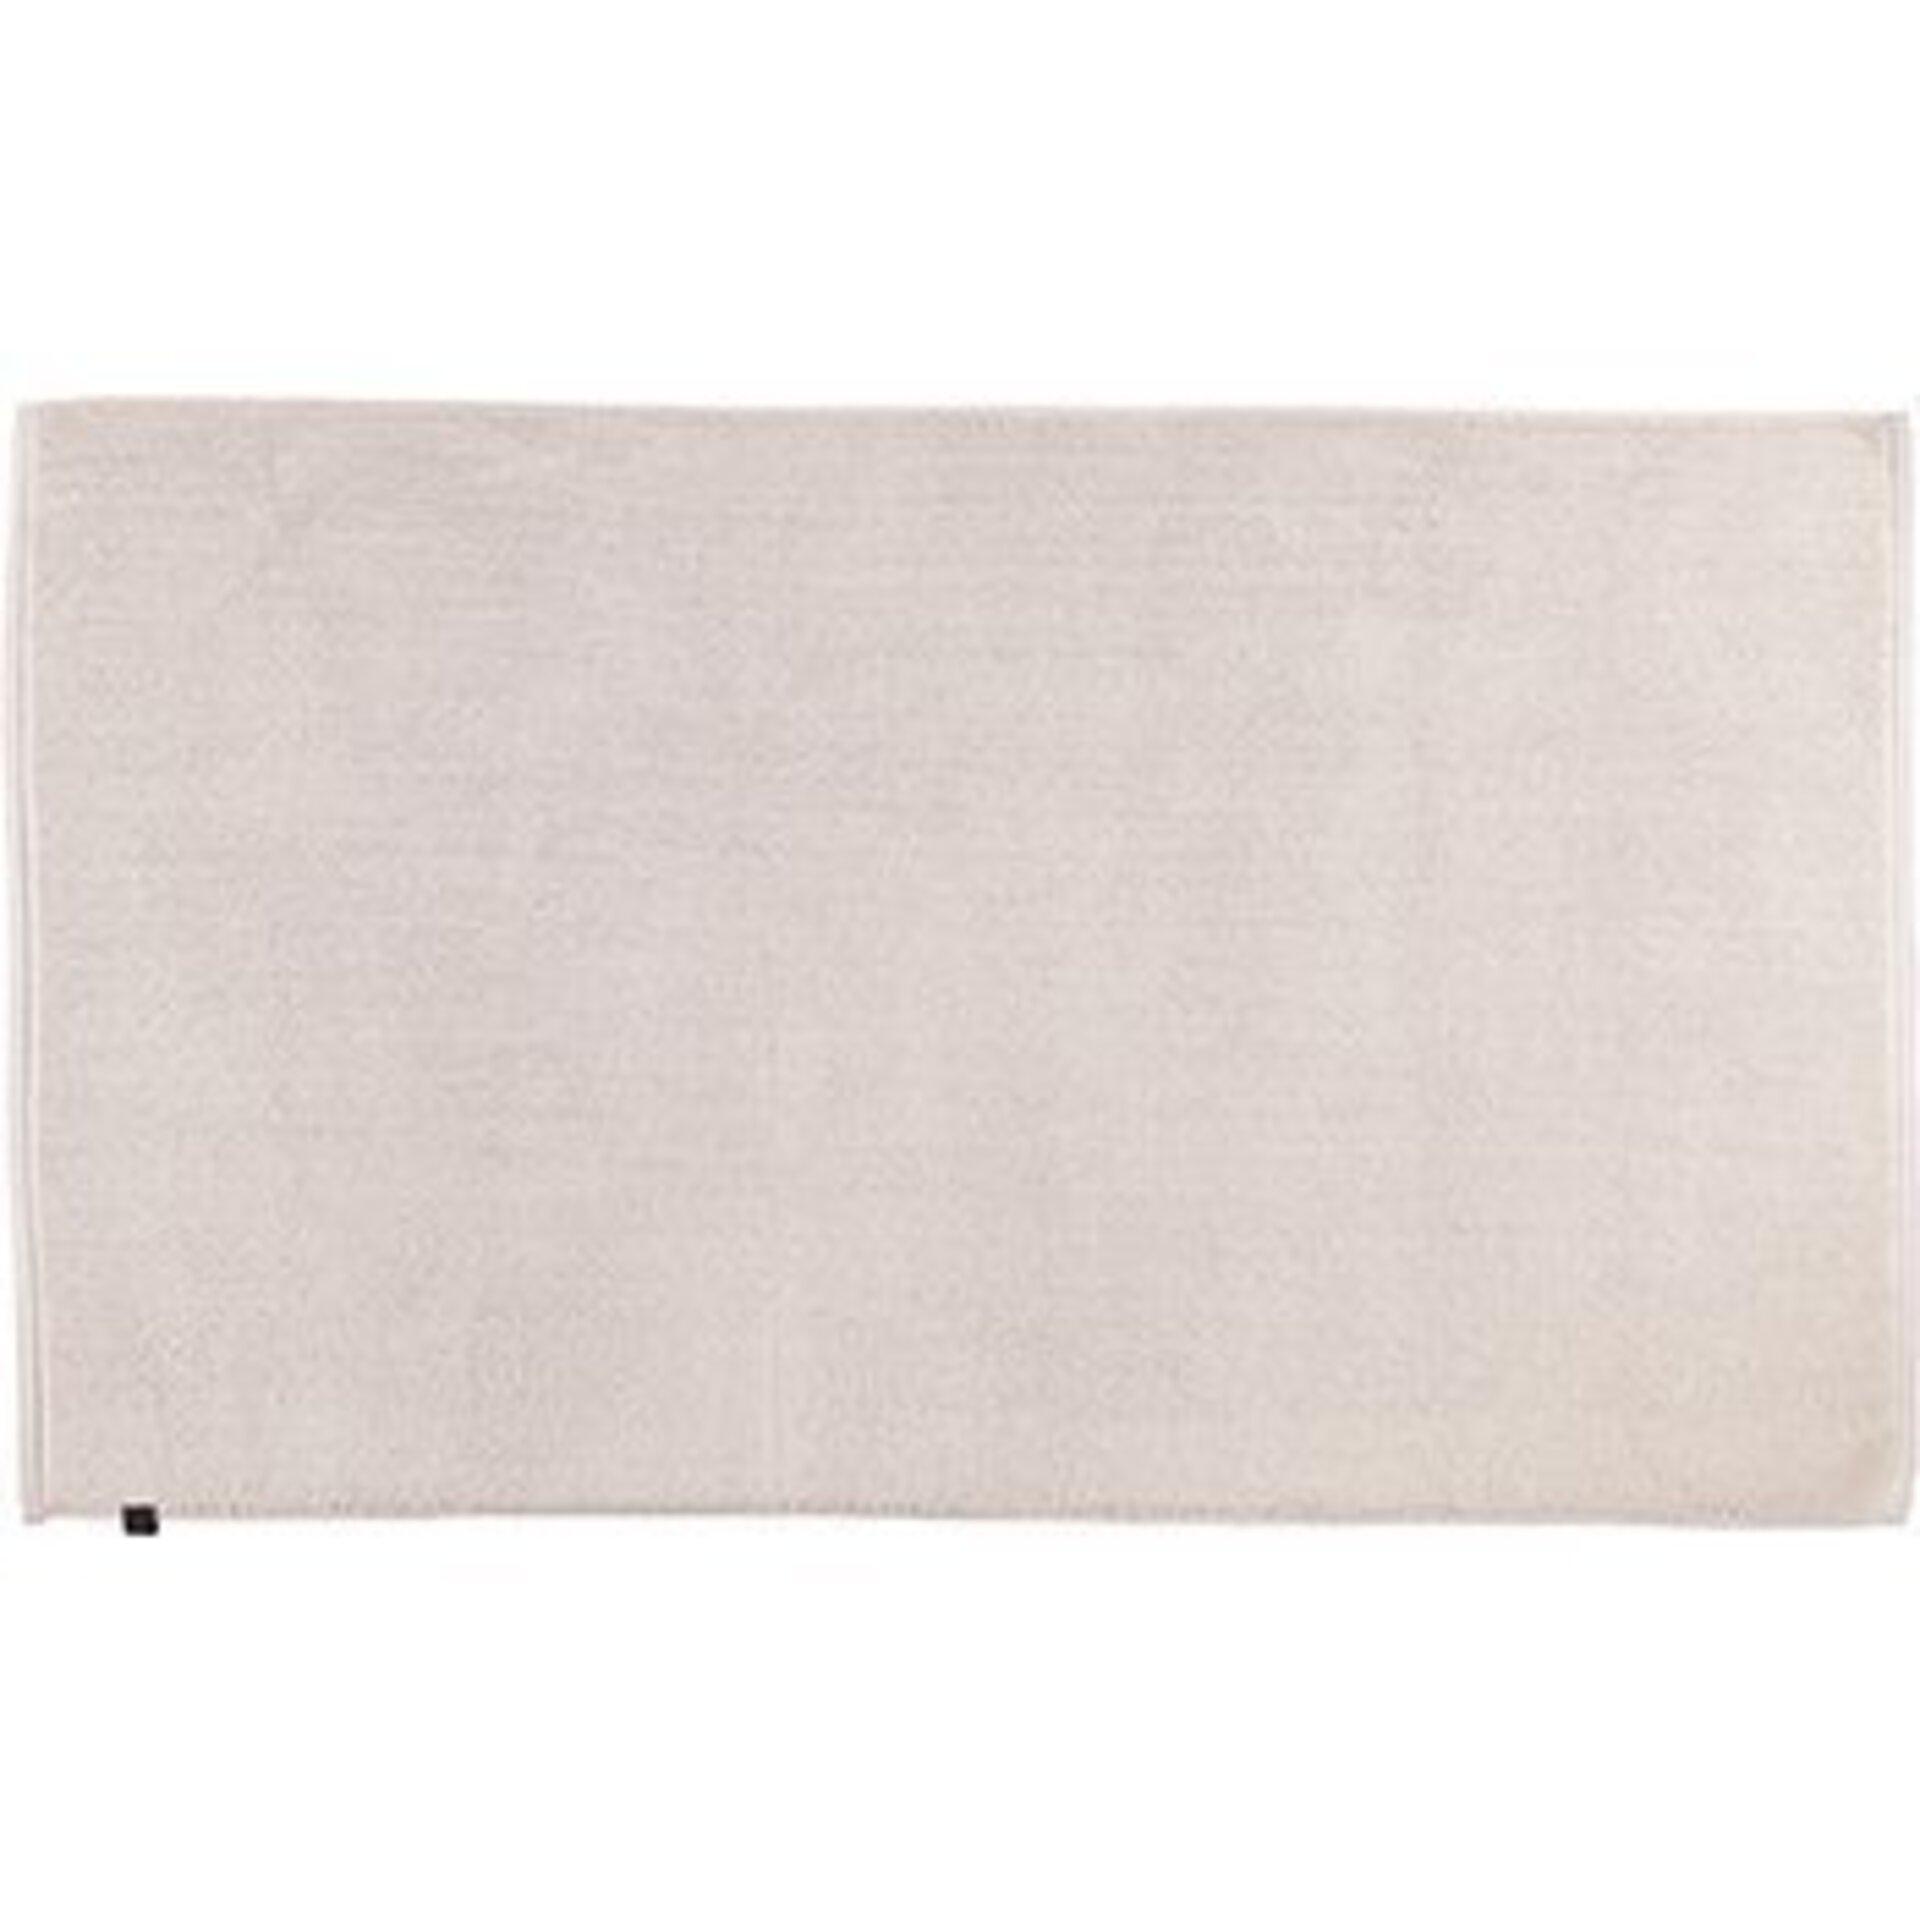 Badteppich Loop Cawö Textil 60 x 100 cm